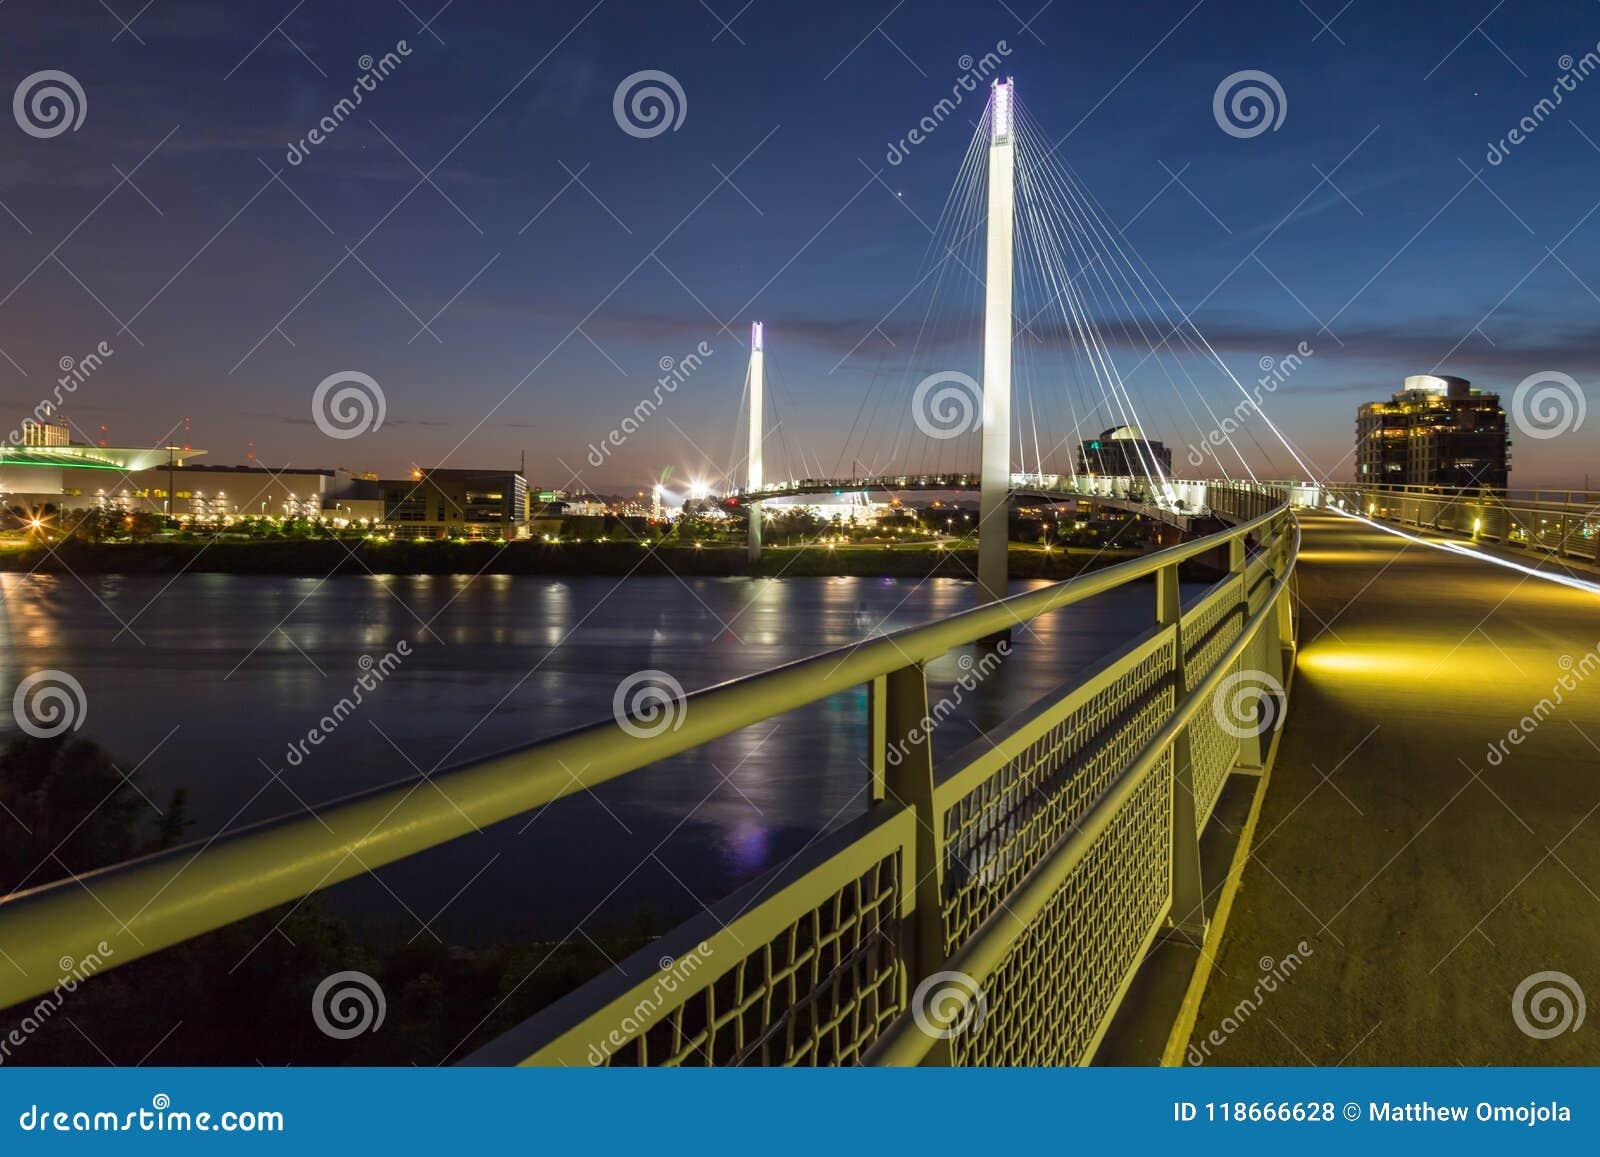 Bob Kerrey foot bridge with Omaha Nebraska skyline with beautiful sky colors just after sunset